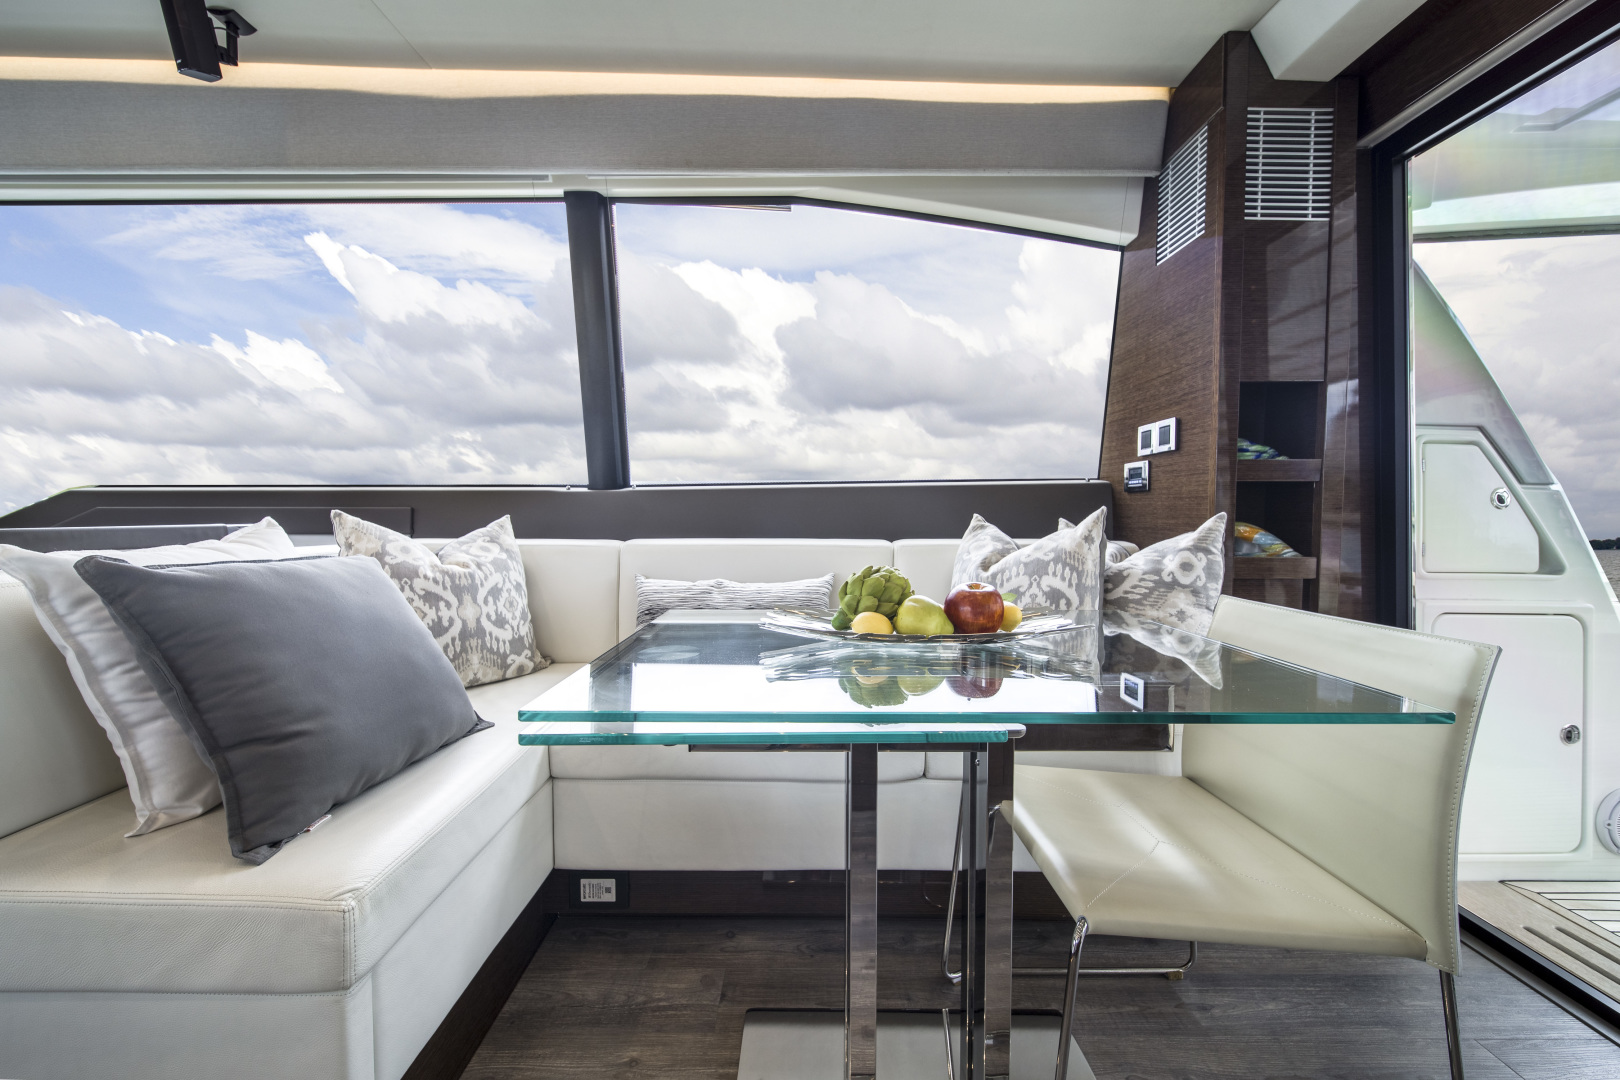 Prestige-680 Flybridge 2018-Seduction Sarasota-Florida-United States-2018 68 Prestige 680 Flybridge  Dining-1498915 | Thumbnail